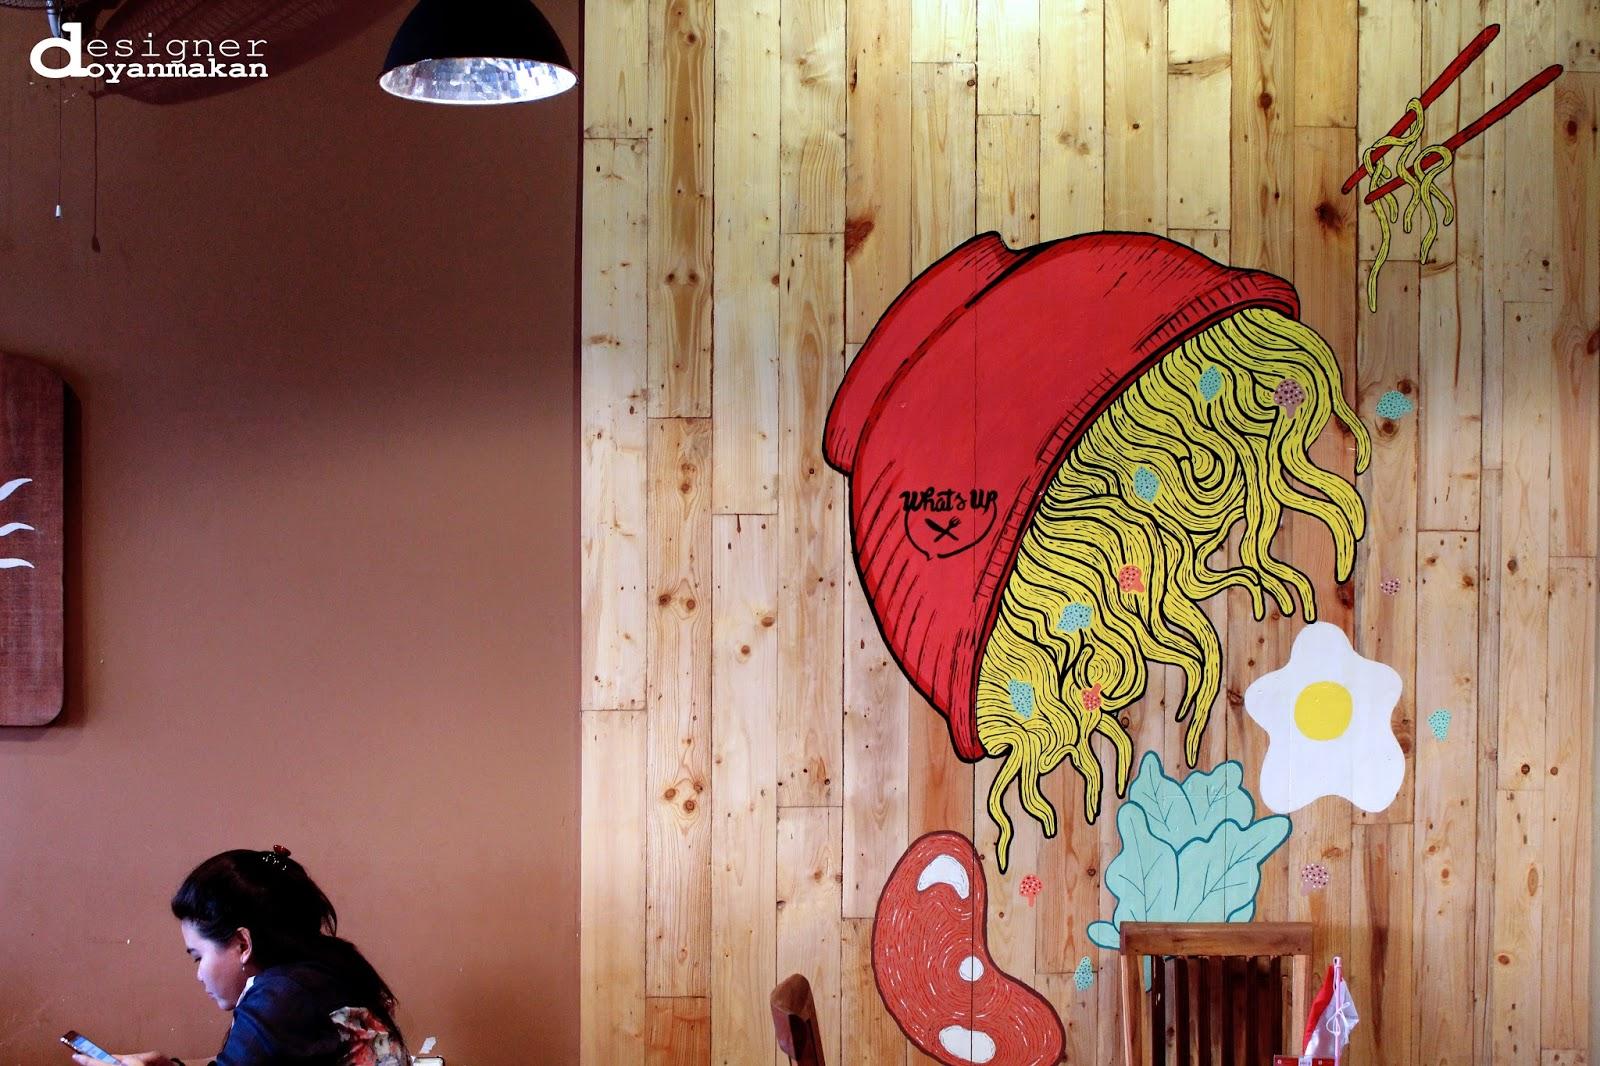 designer doyan makan: what's up cafe, depok